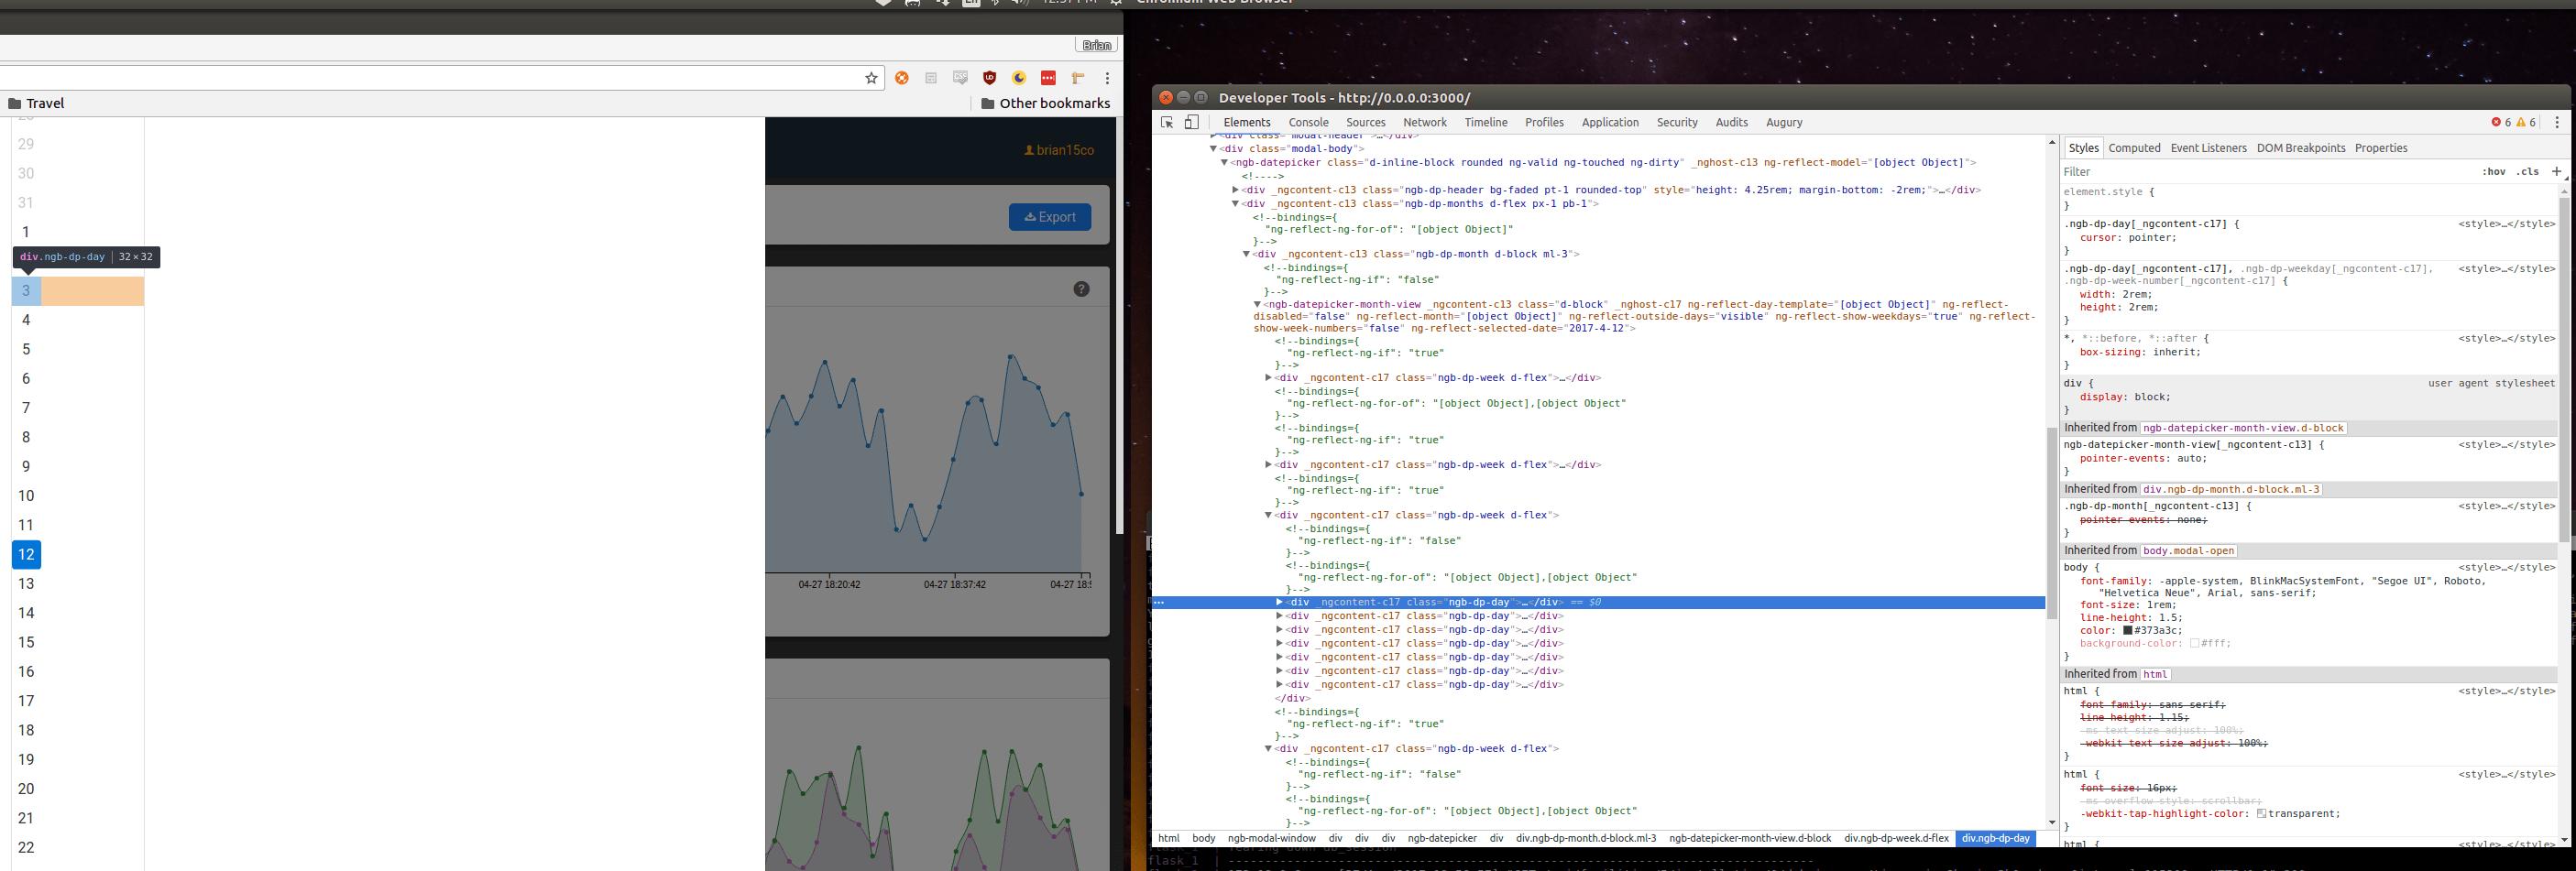 Timepicker jquery stack overflow